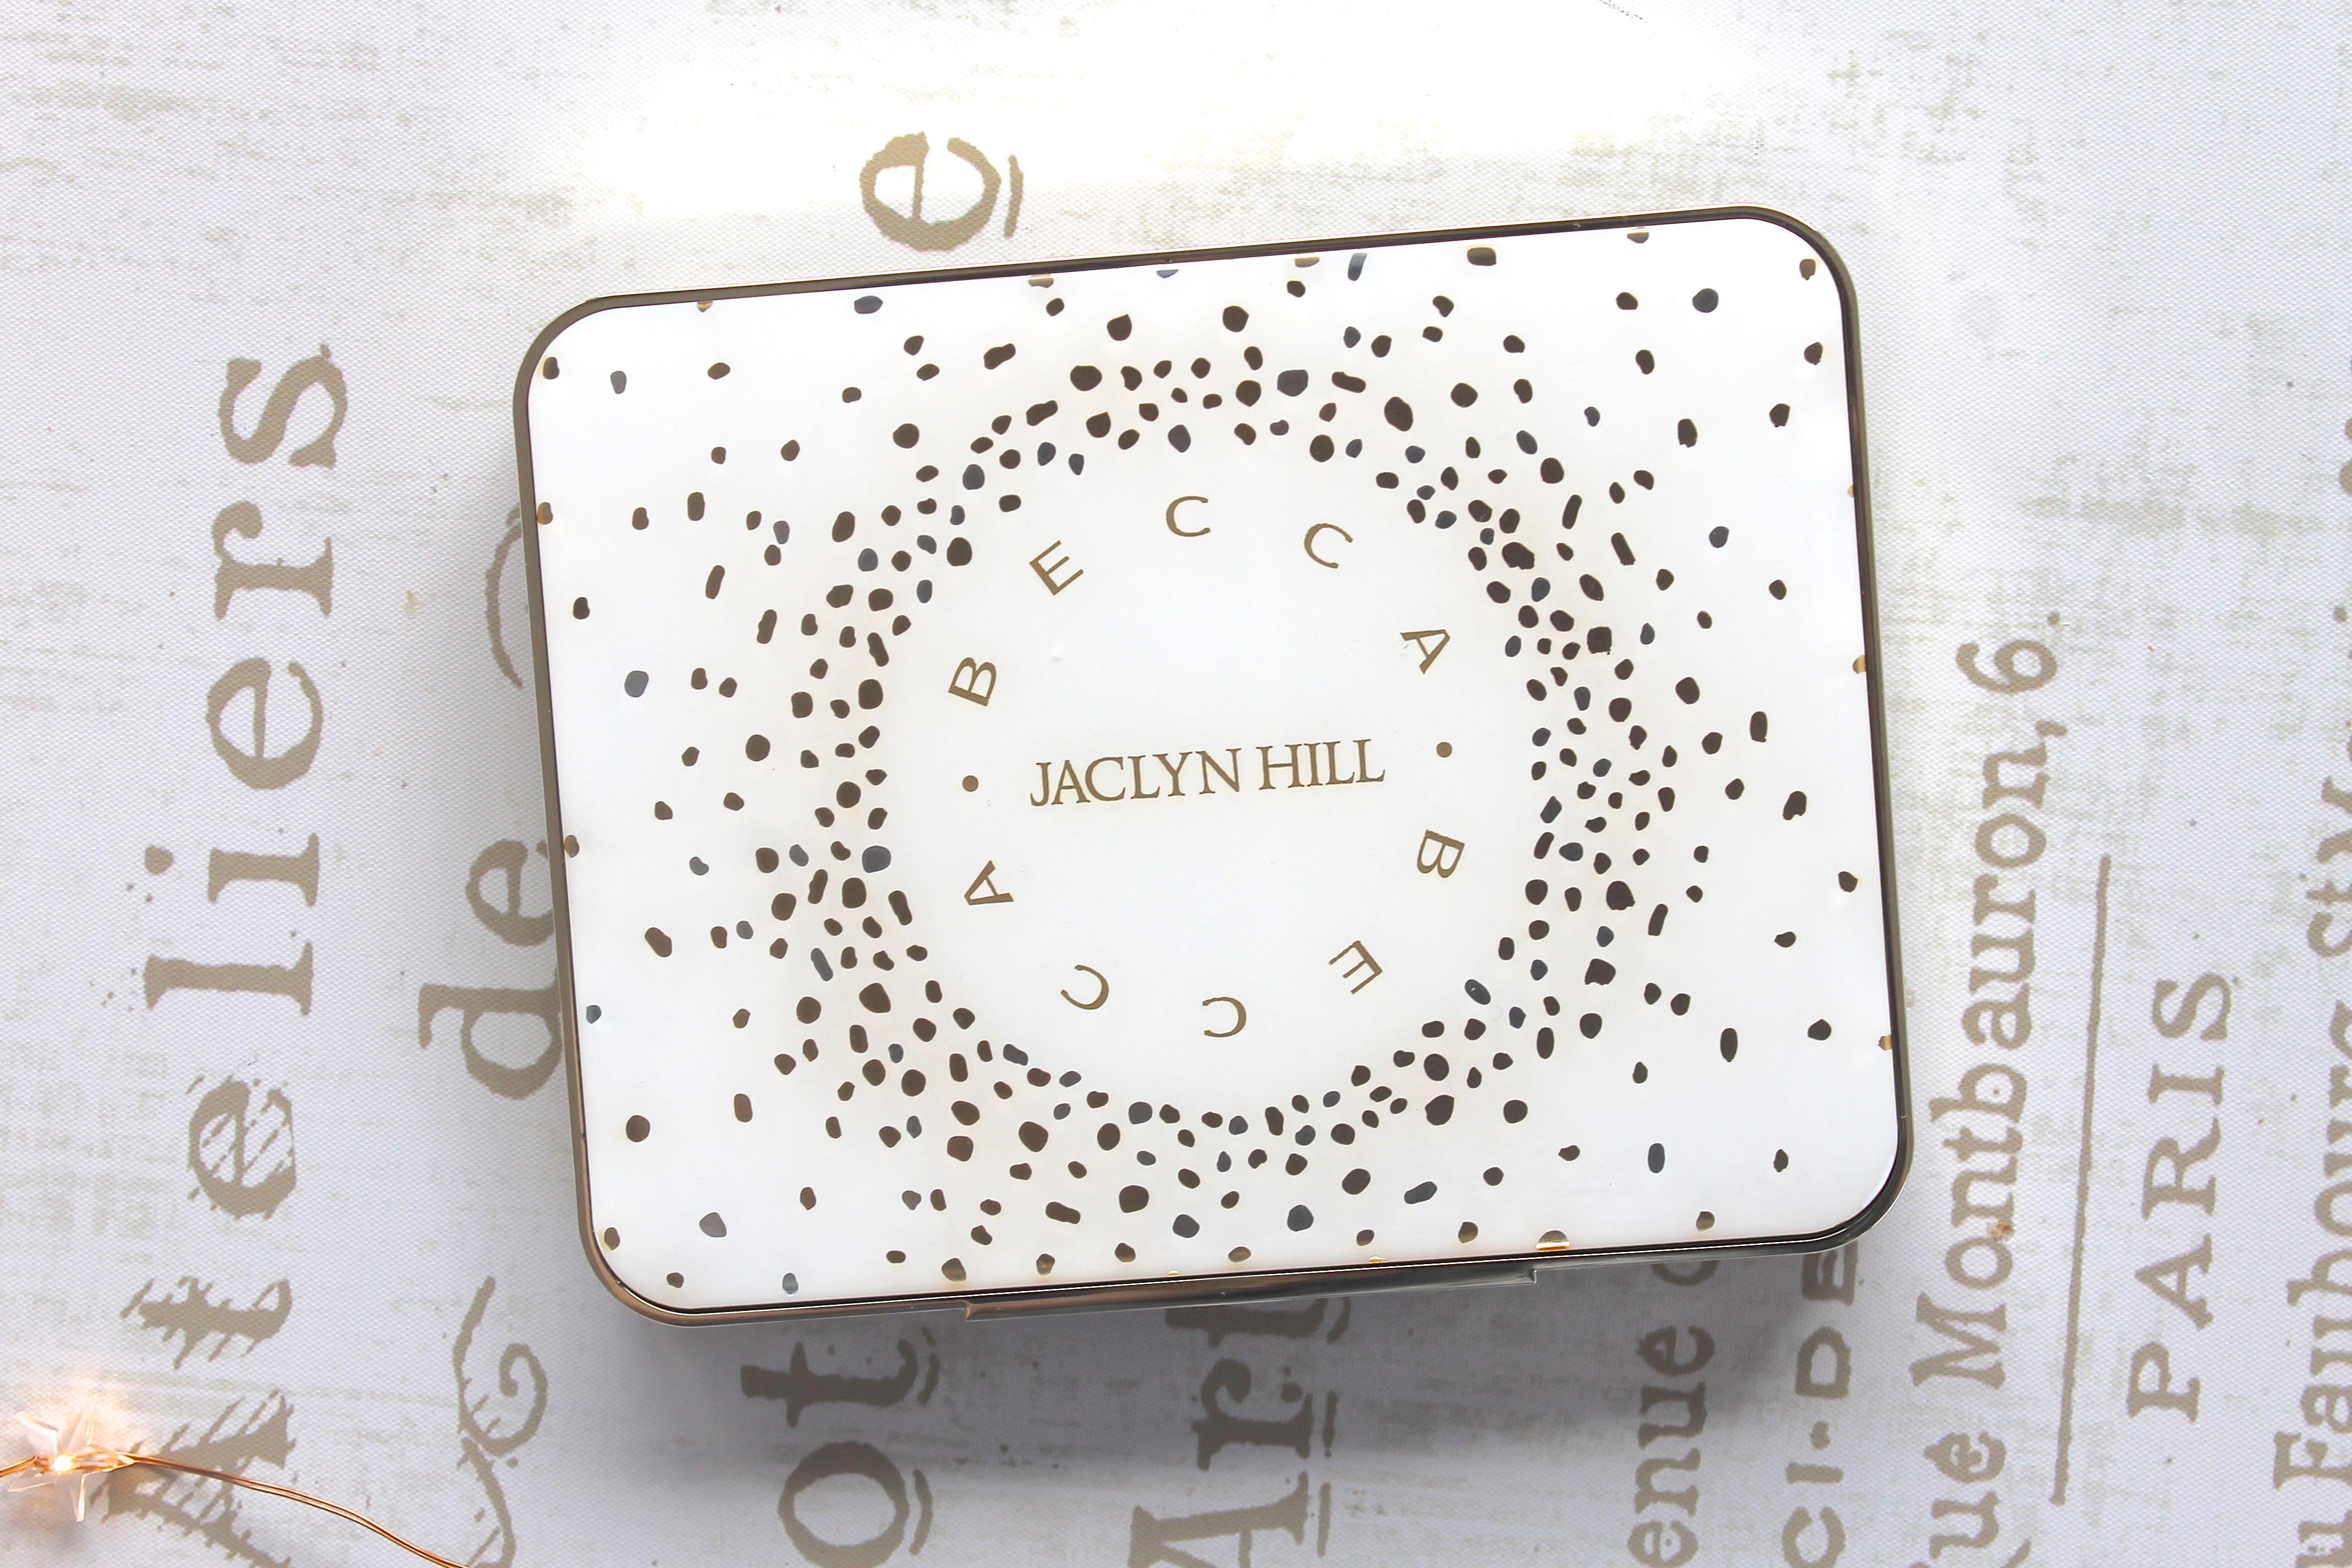 becca jaclyn hill face palette